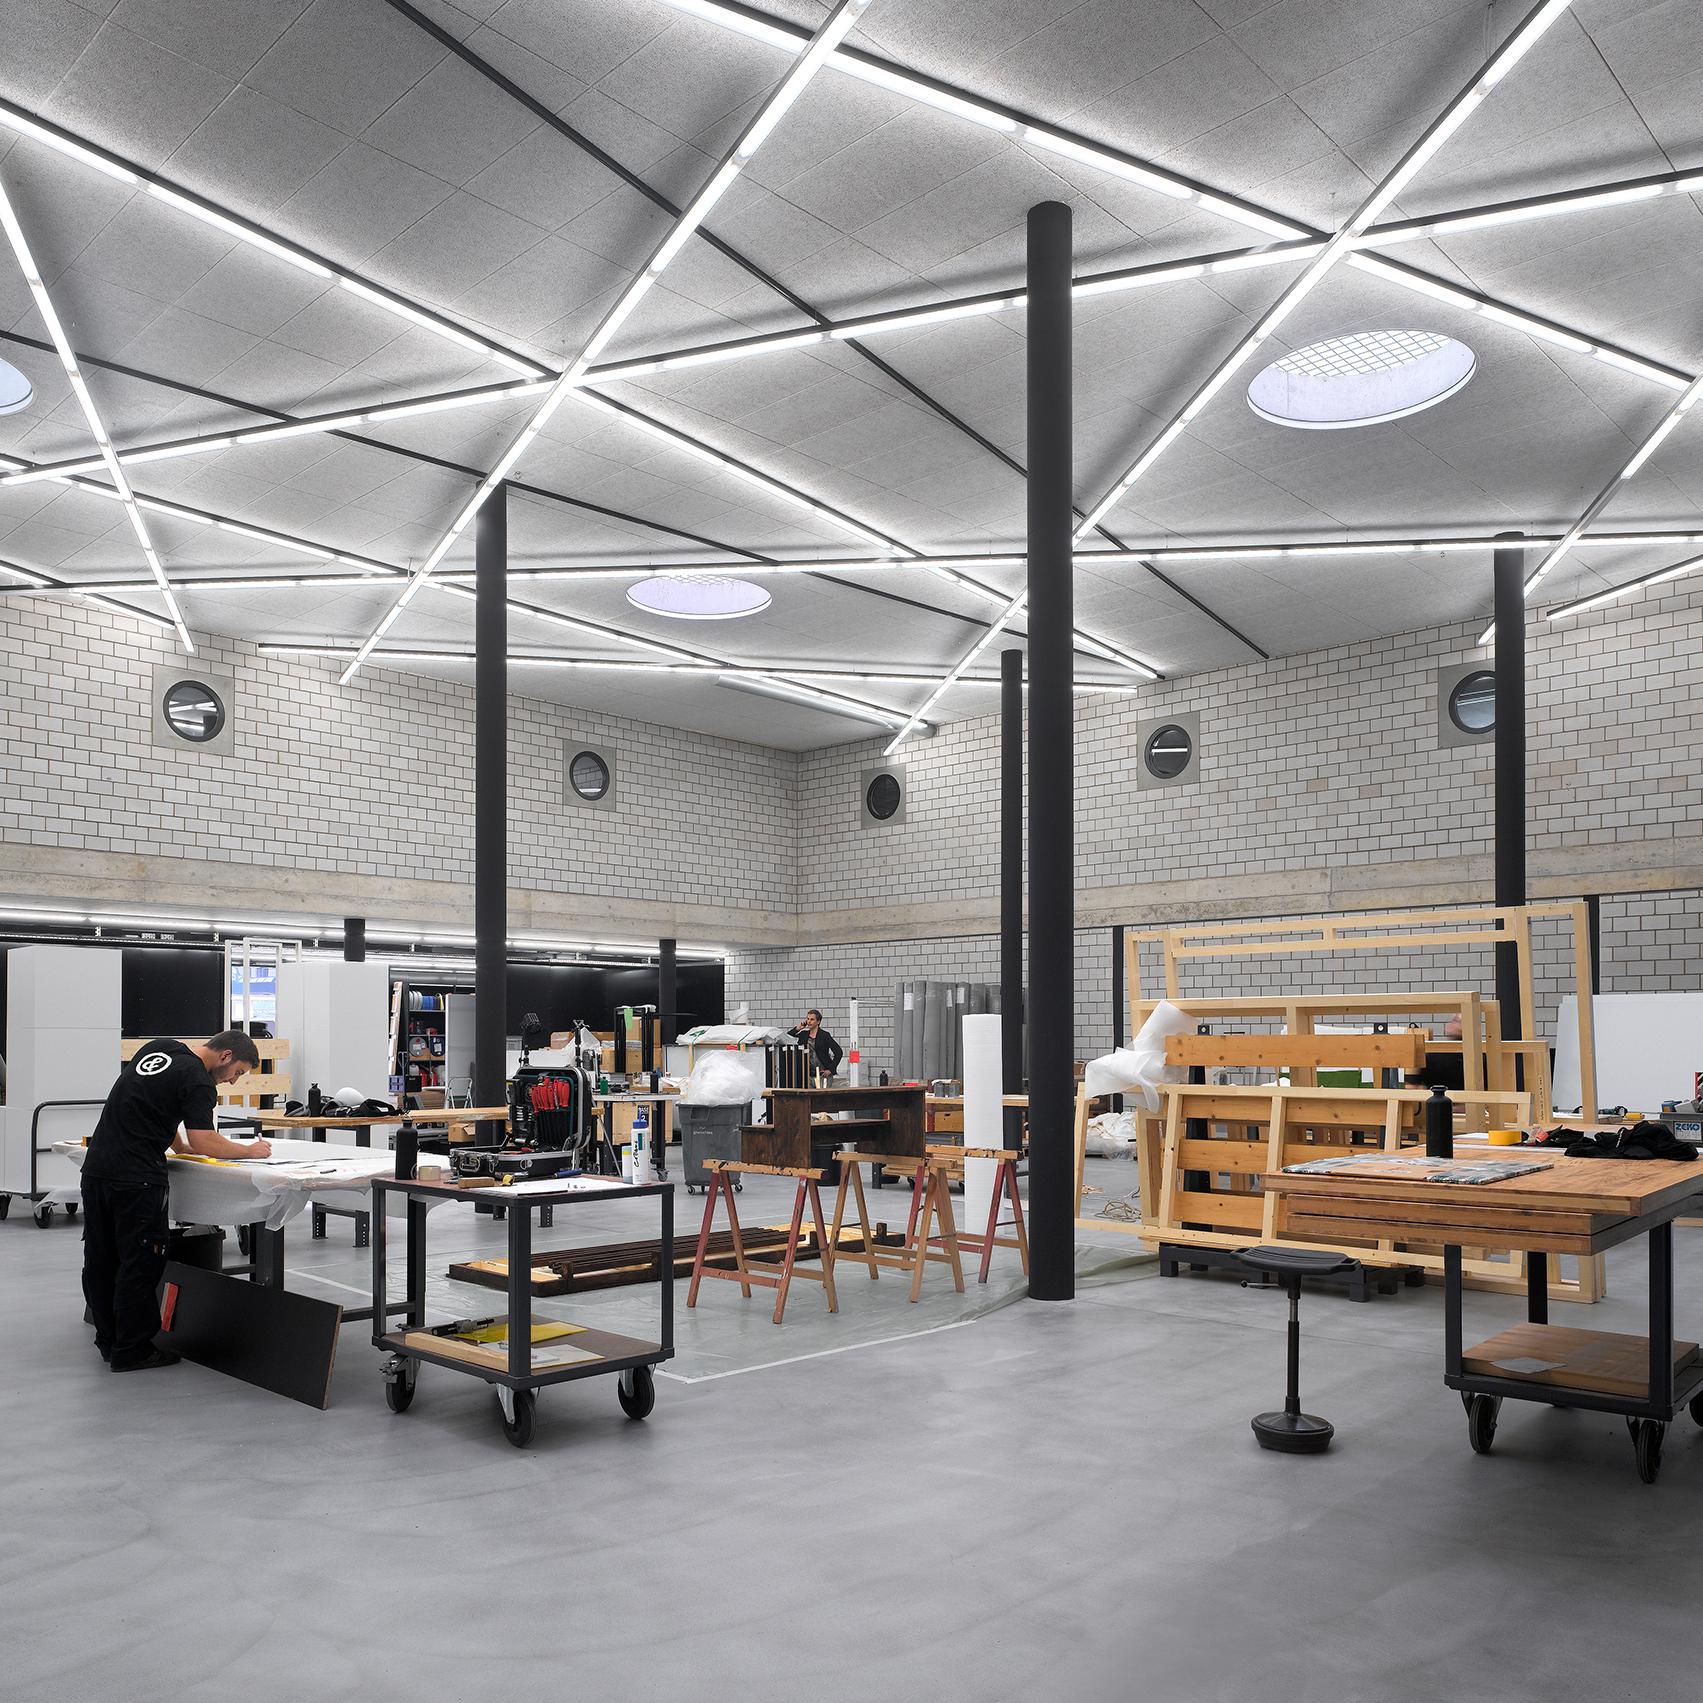 hauser & partner Atelier